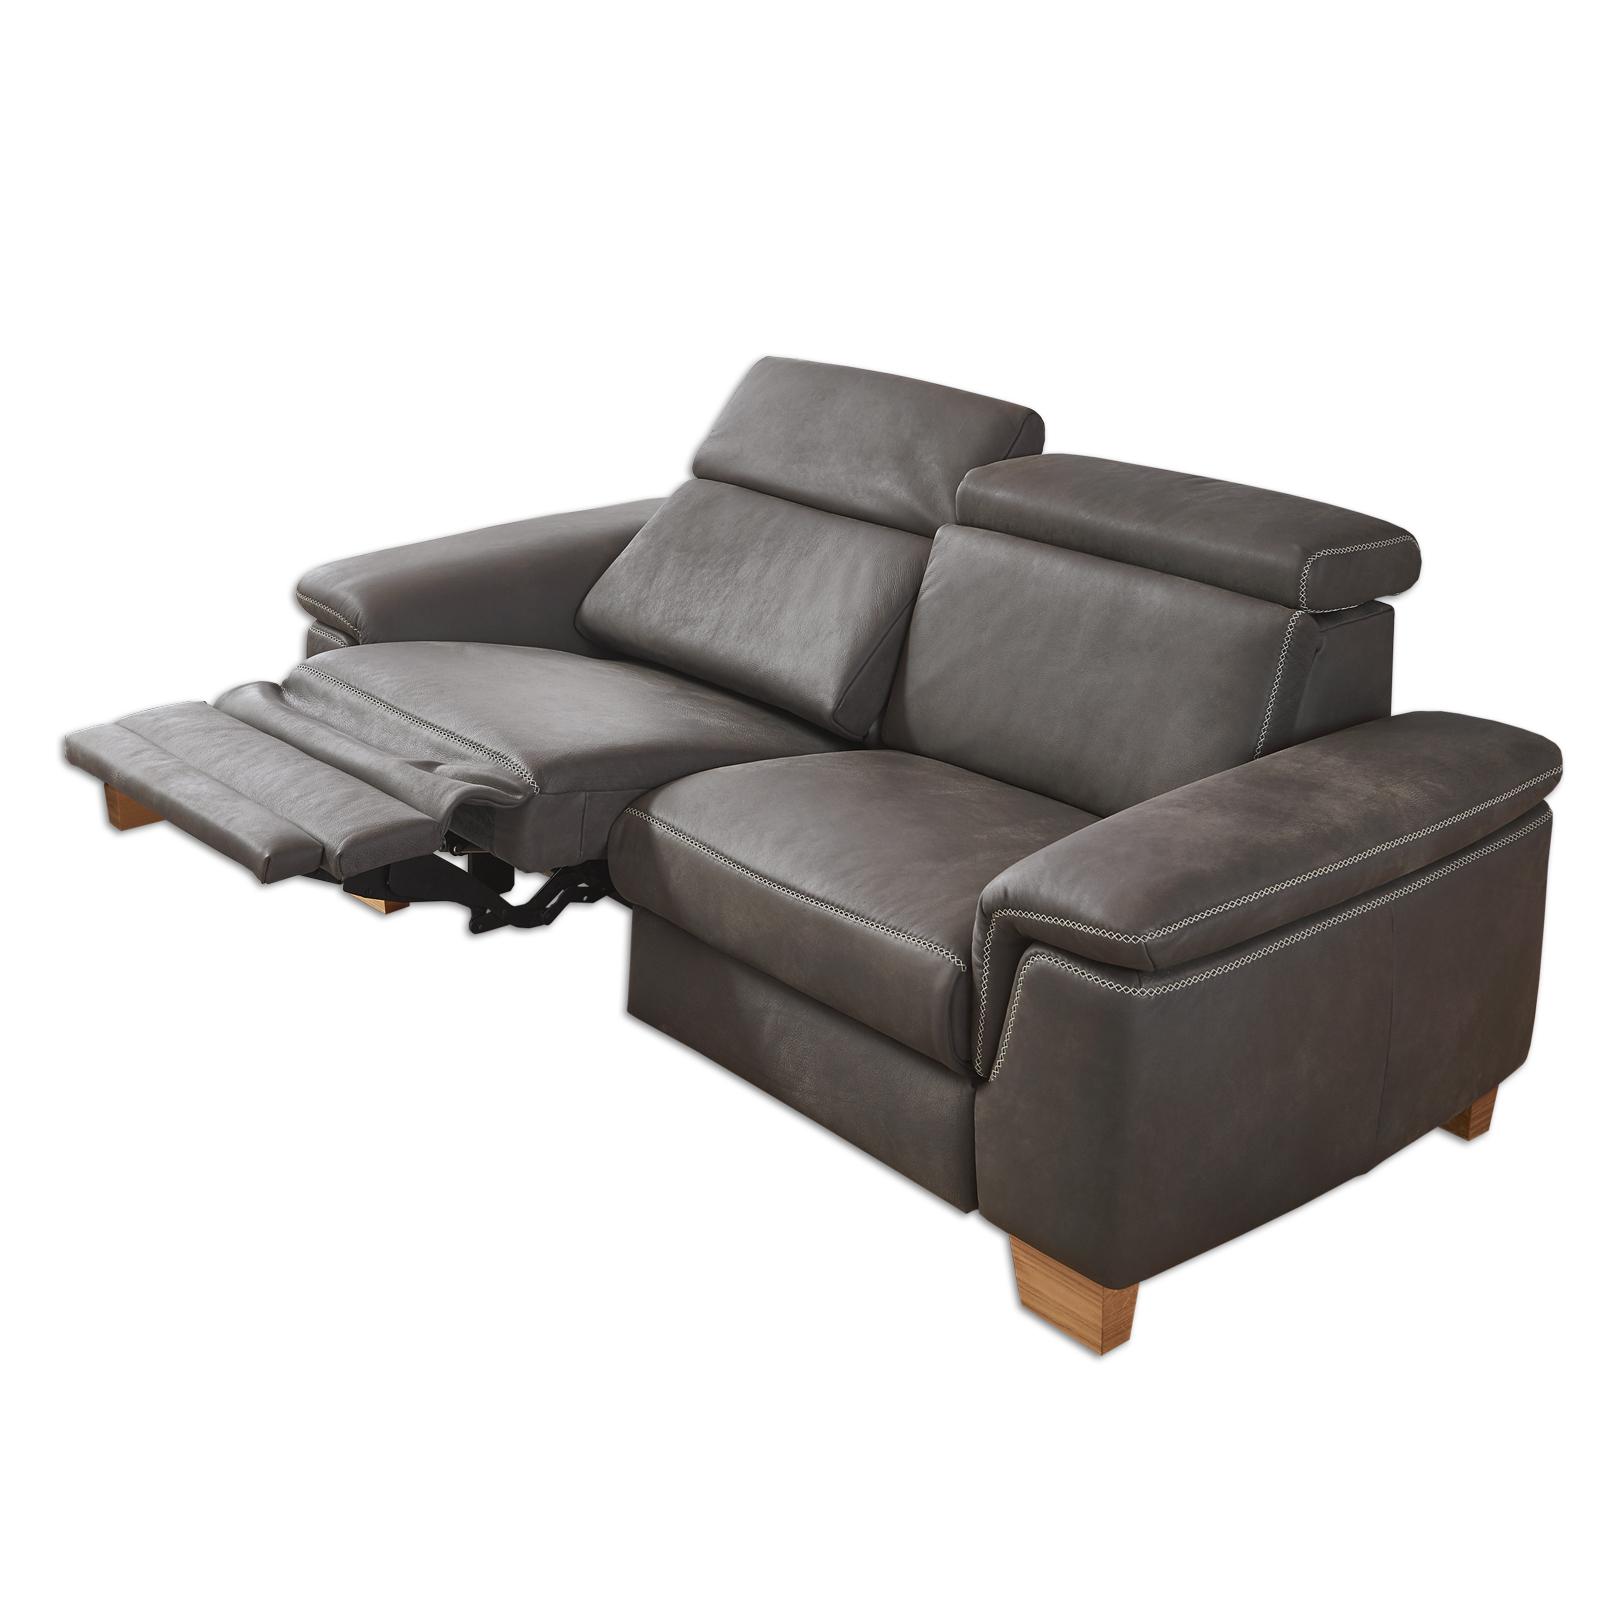 Full Size of Sofa 2 5 Sitzer Grau Landhausstil Mit Schlaffunktion Couch Leder Microfaser Stoff Relaxfunktion Federkern Elektrisch Marilyn Big Kolonialstil Karup Auf Raten Sofa Sofa 2 5 Sitzer